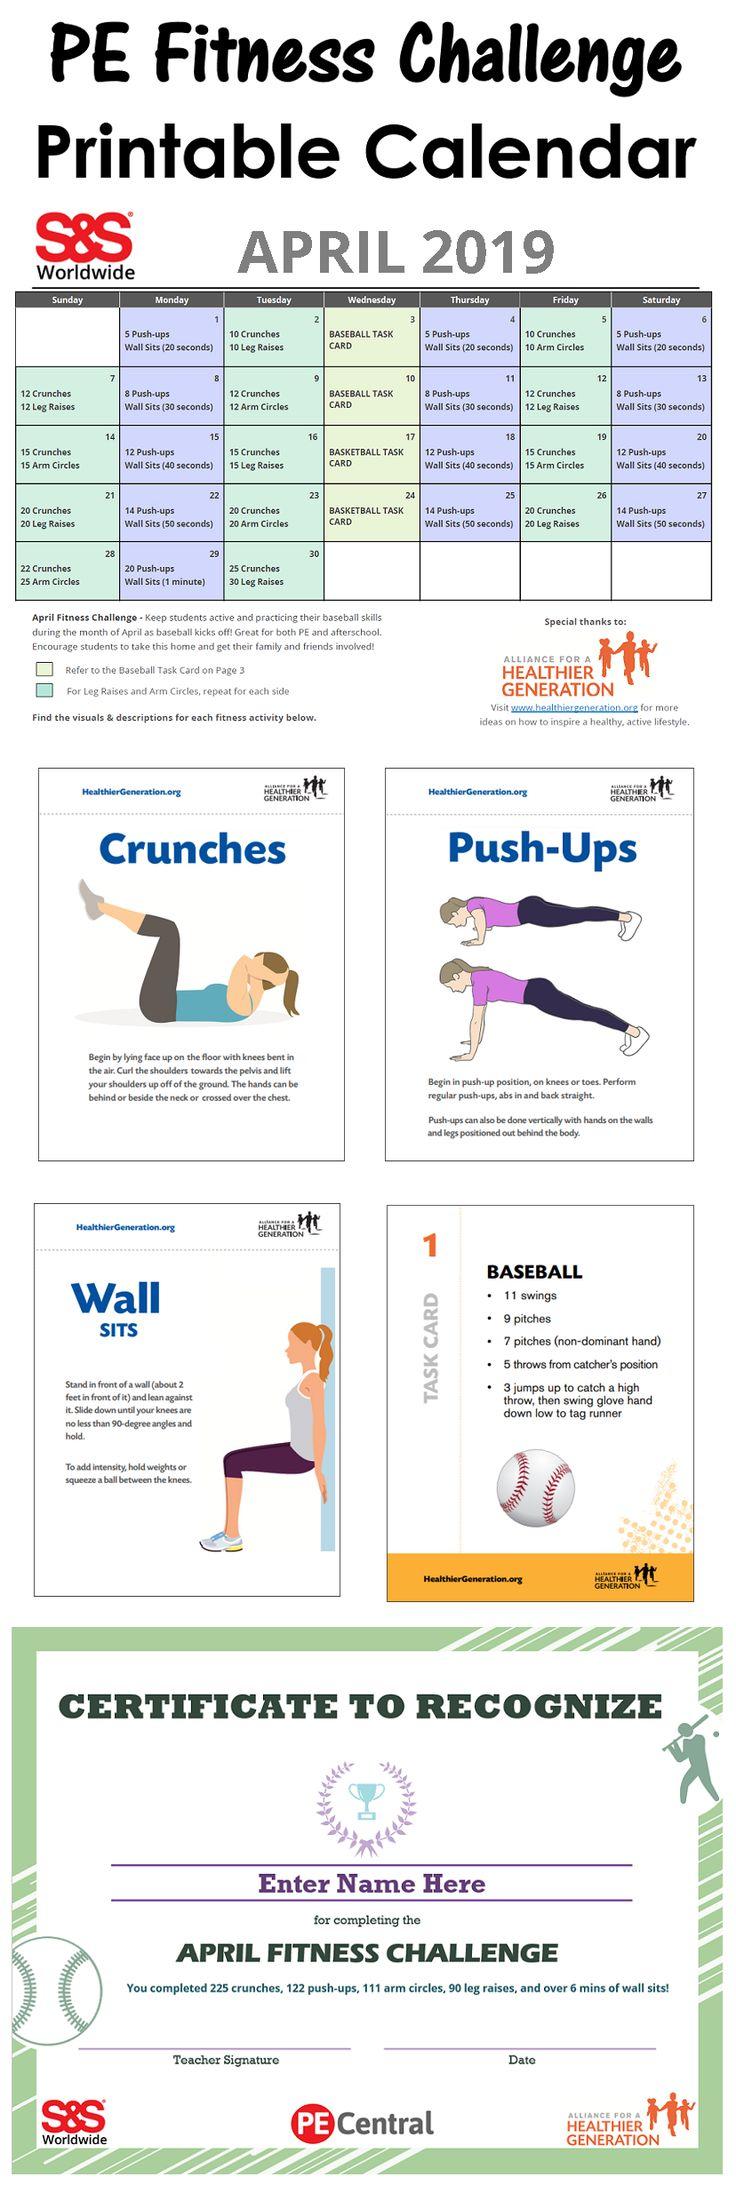 April Printable Fitness Challenge Calendar   Workout Regarding April Fitness Challenge